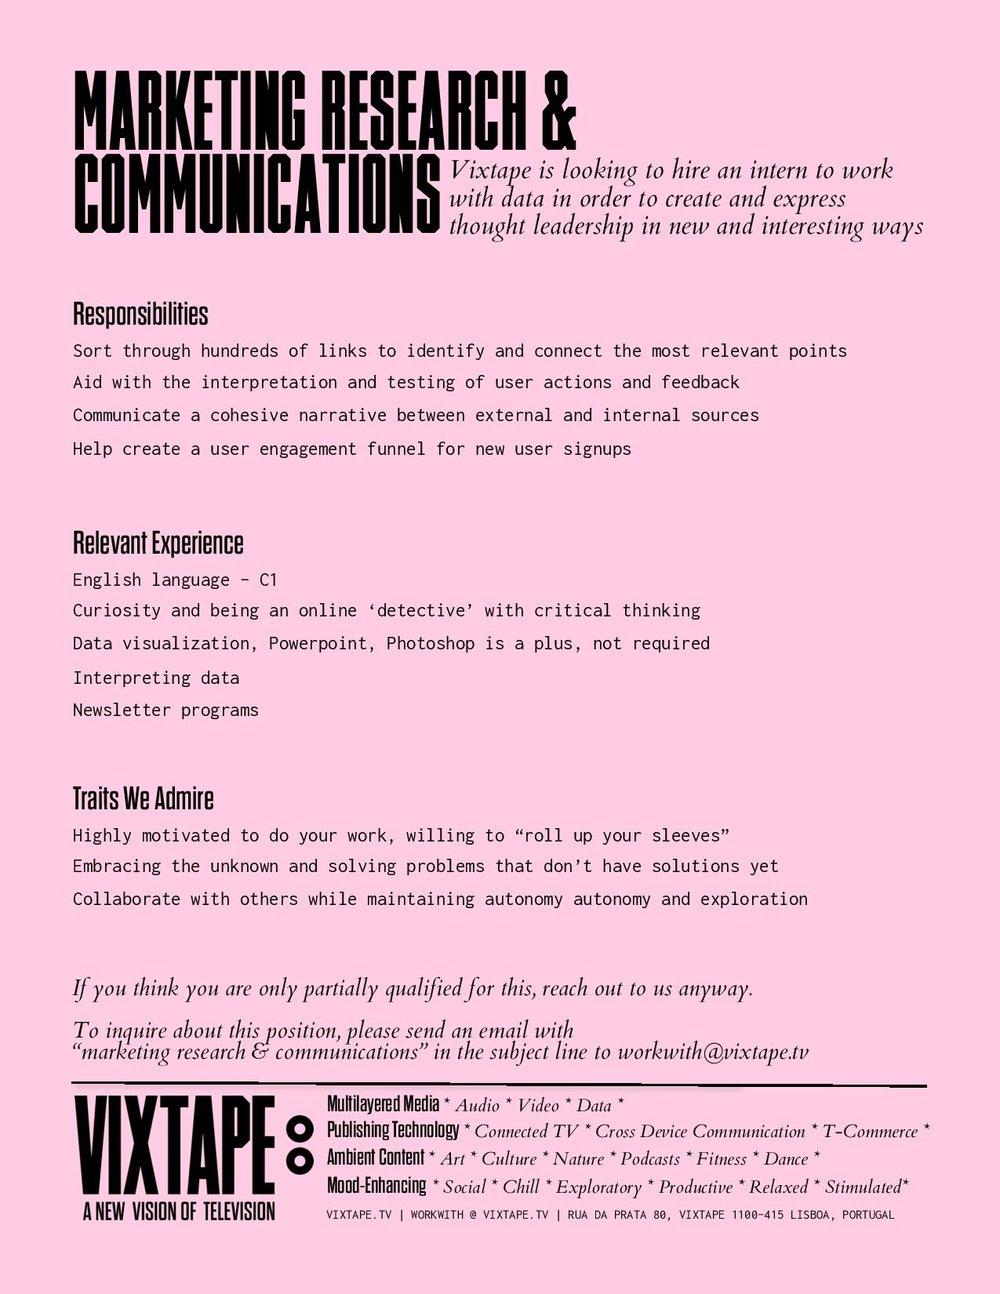 Vixtape-MarketResearch-Position-page-001.jpg